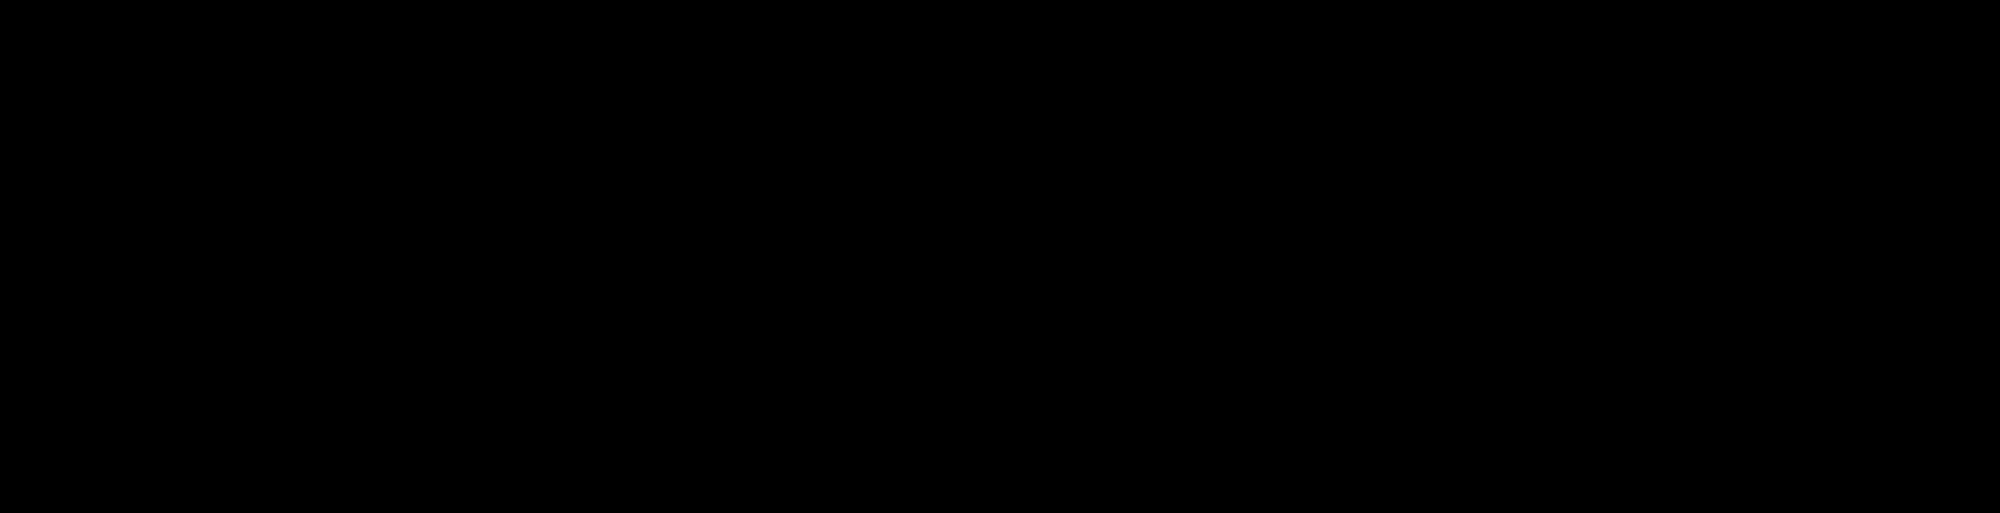 Marshall logo